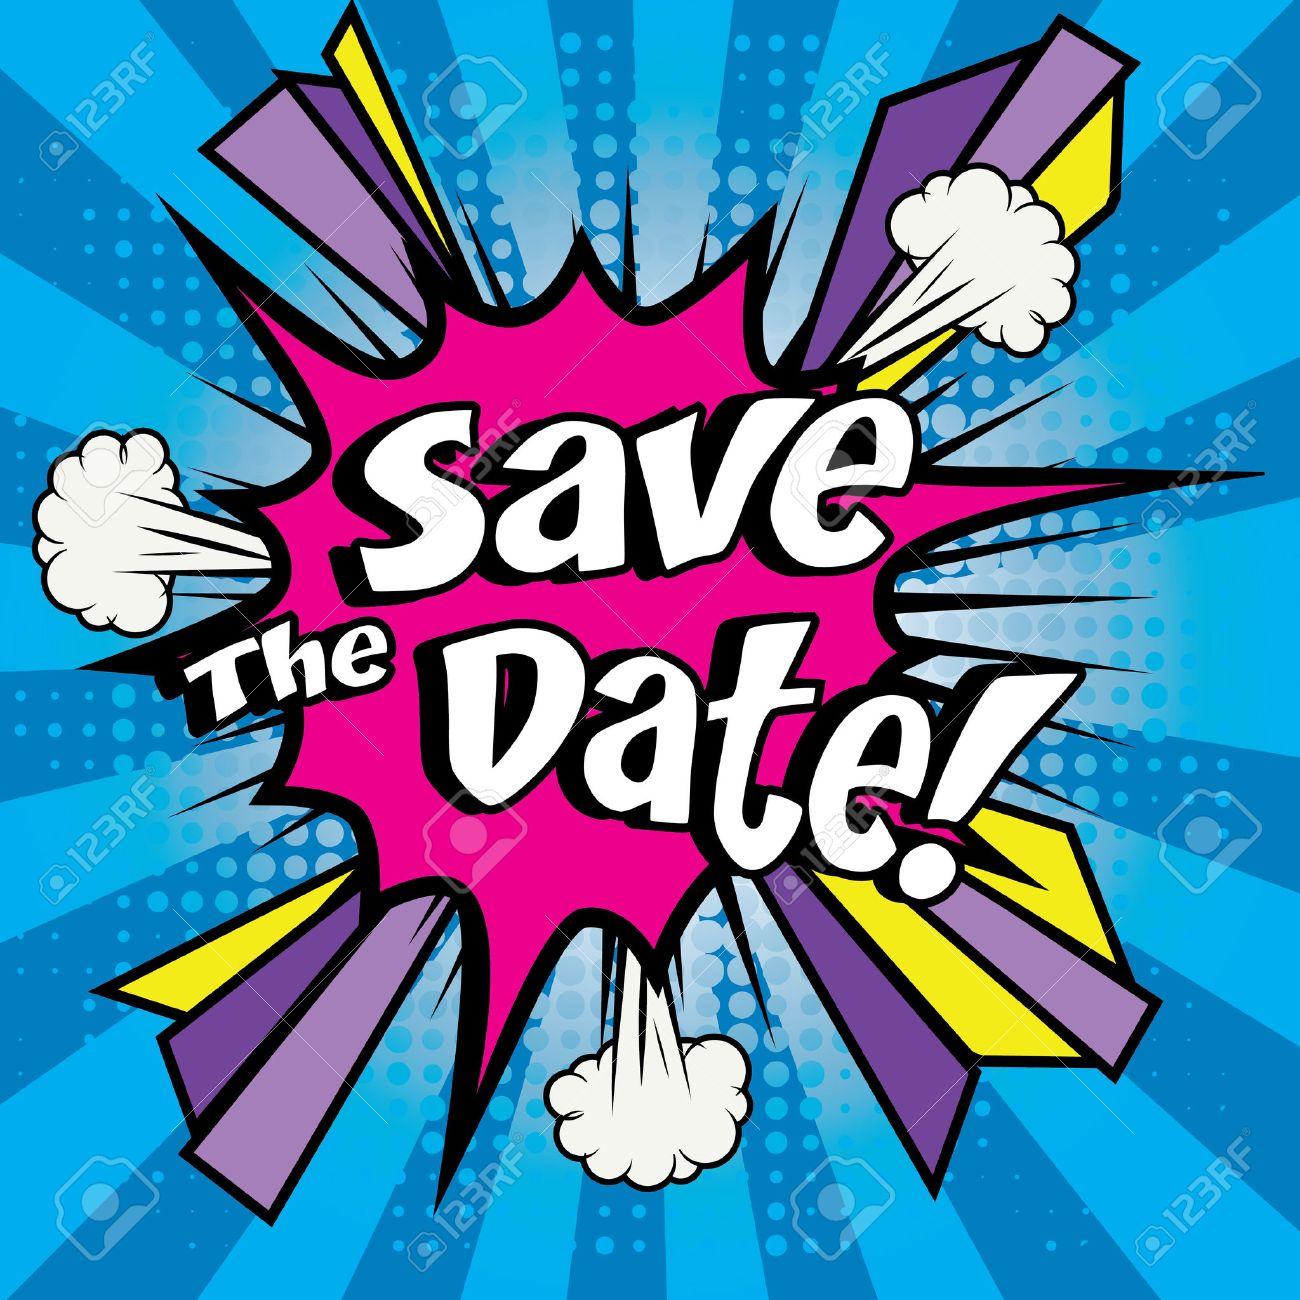 Save the date pop art - 51191158